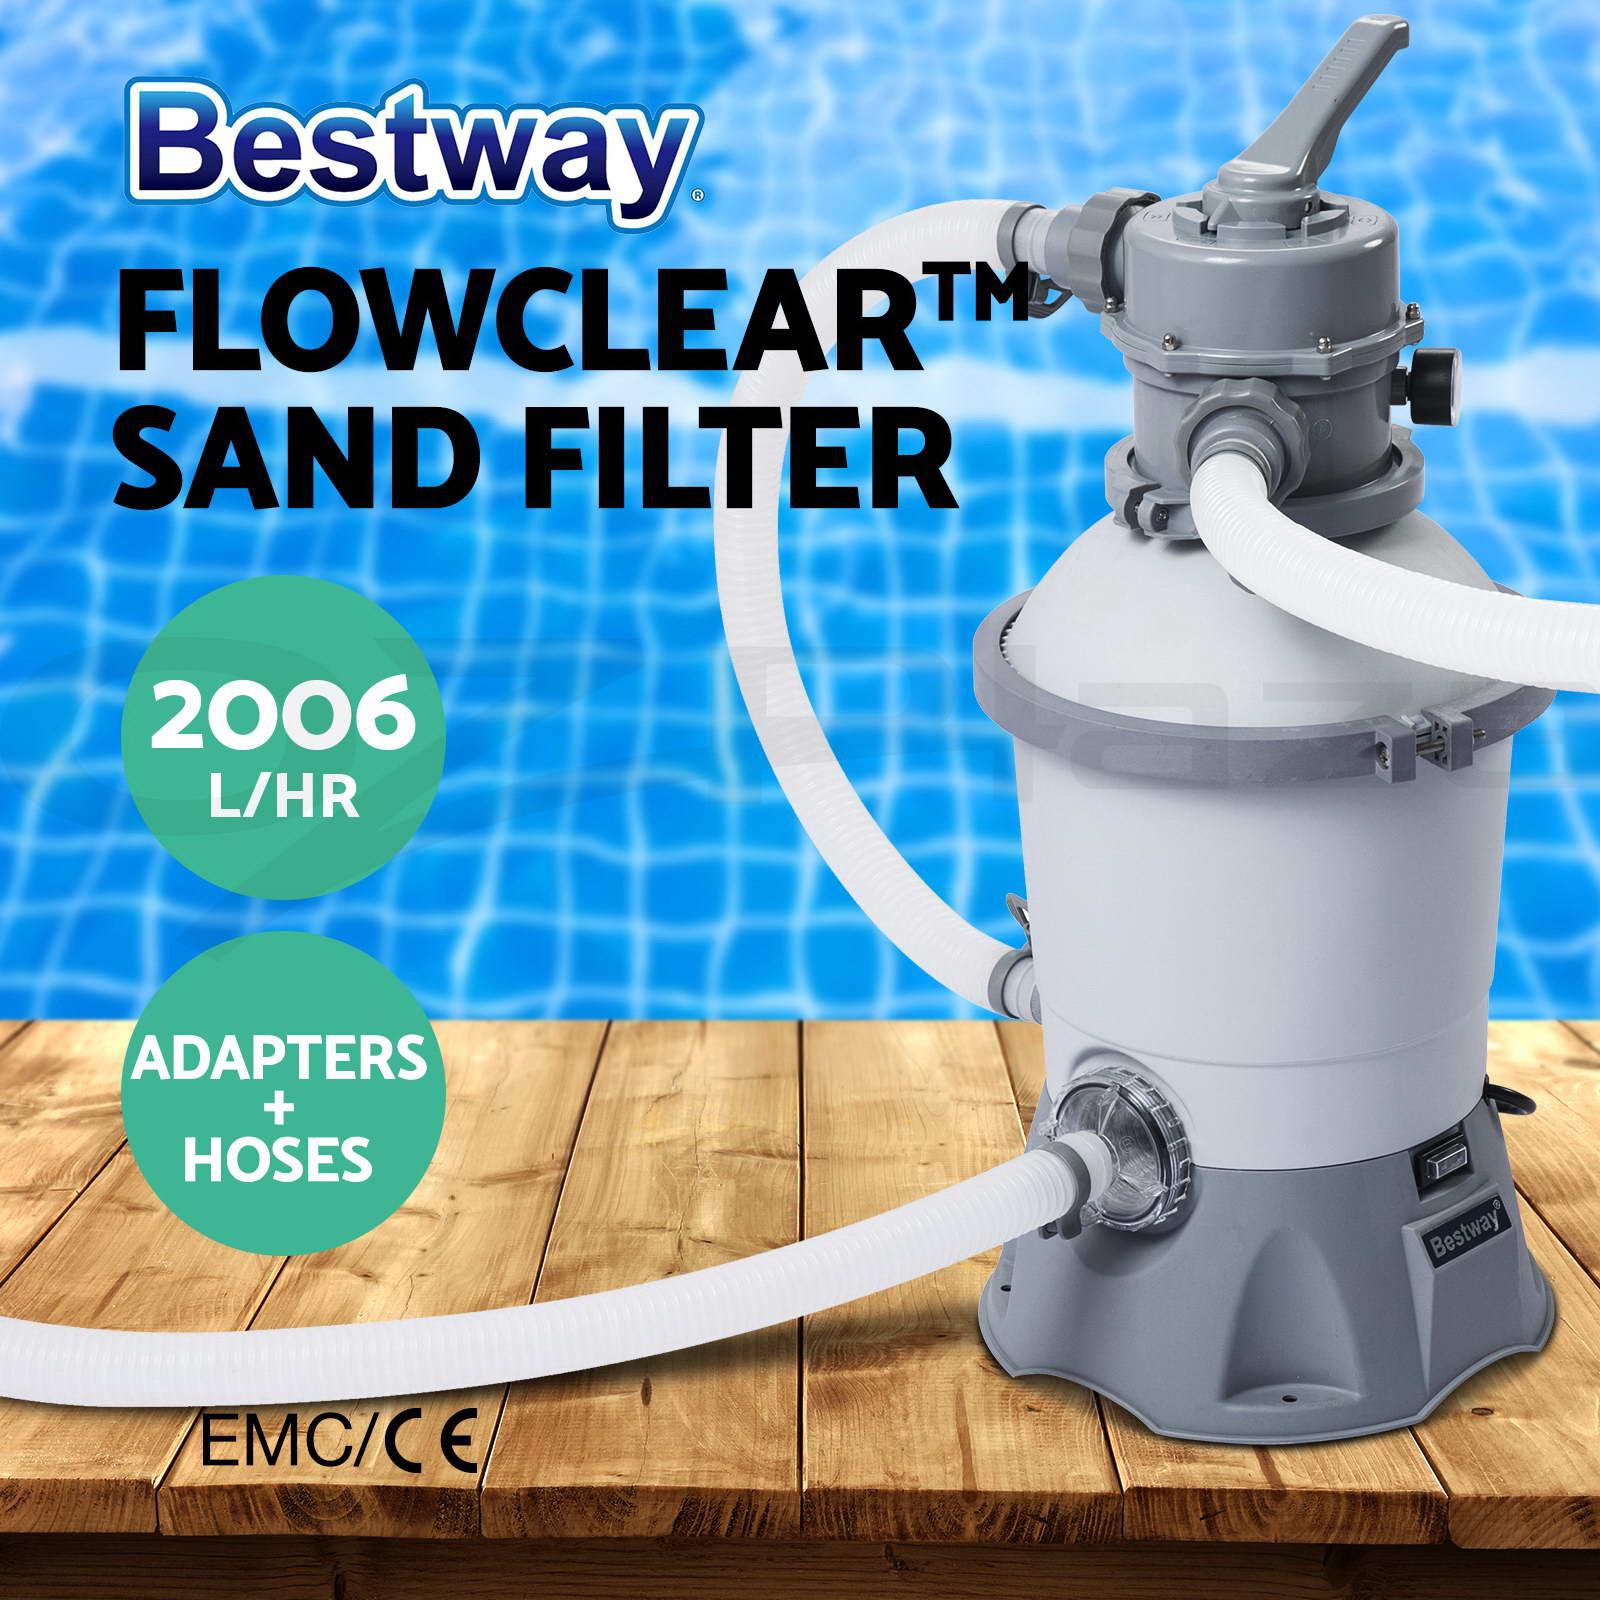 Bestway flowclear filter pump sand filter pool vacuum chlorinator swimming pool ebay for Swimming pool vacuum pump cleaners